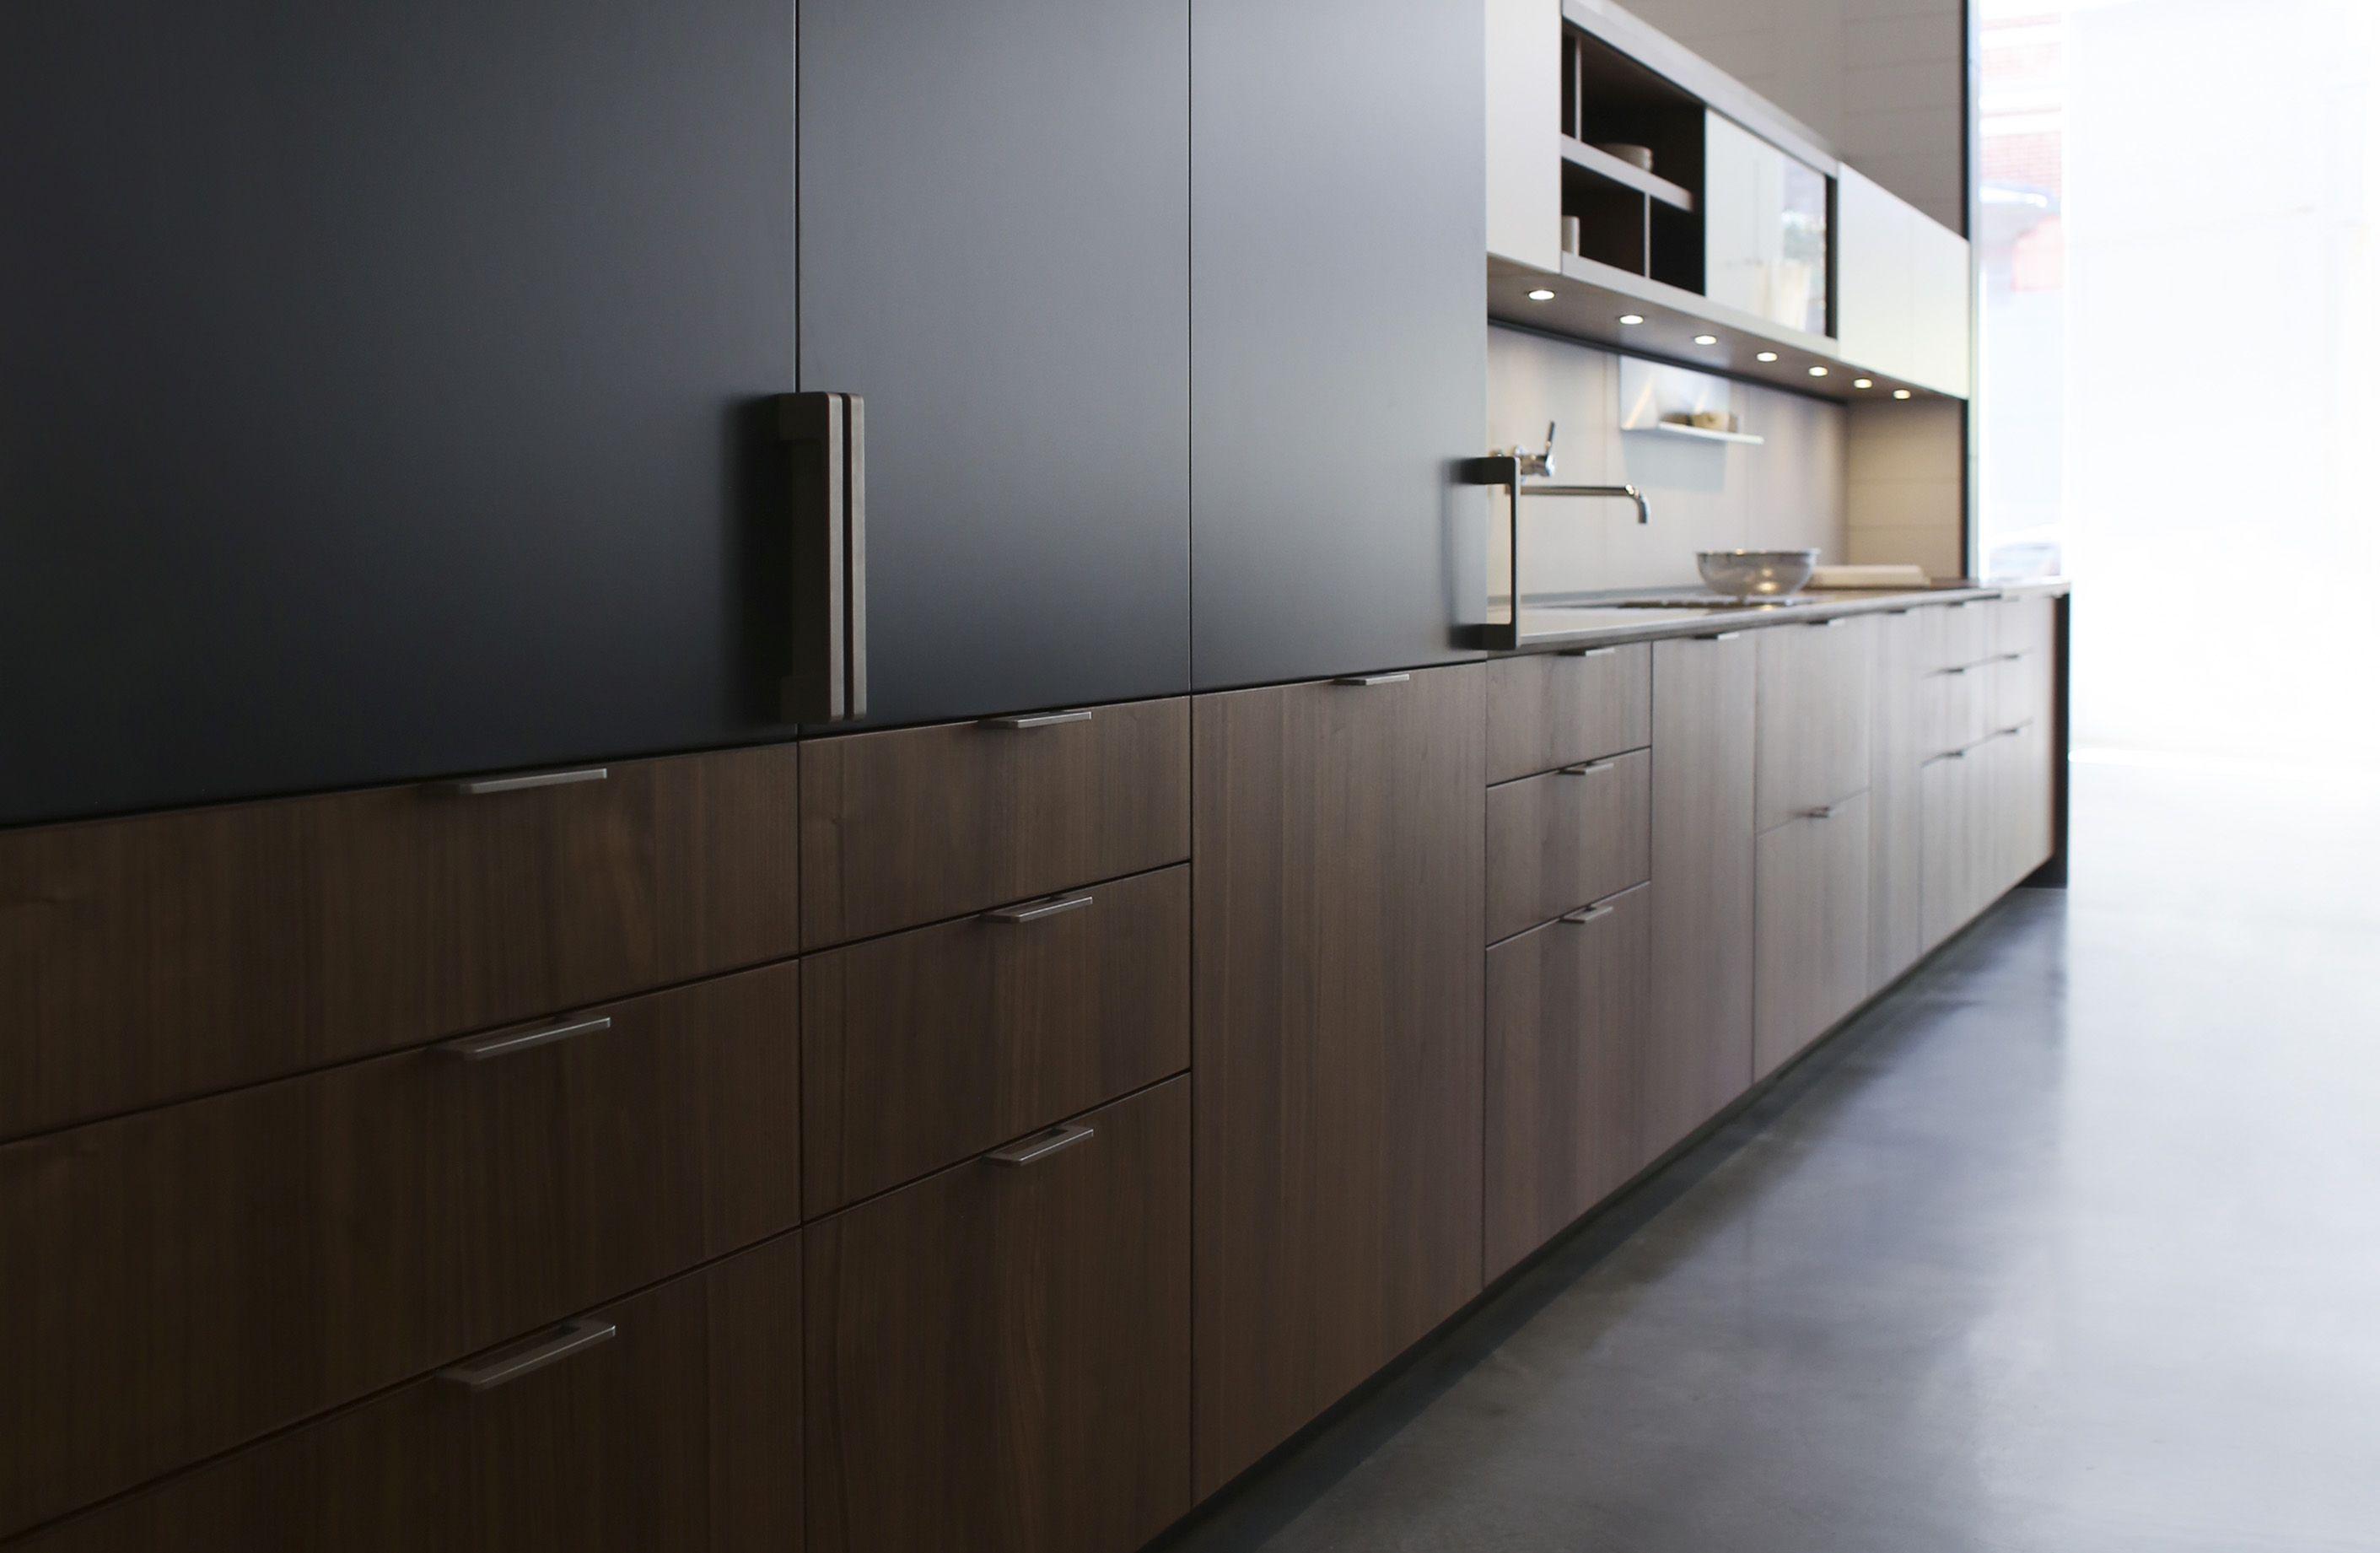 Henrybuilt beautiful spilt tone front for integrated refrigeration ...